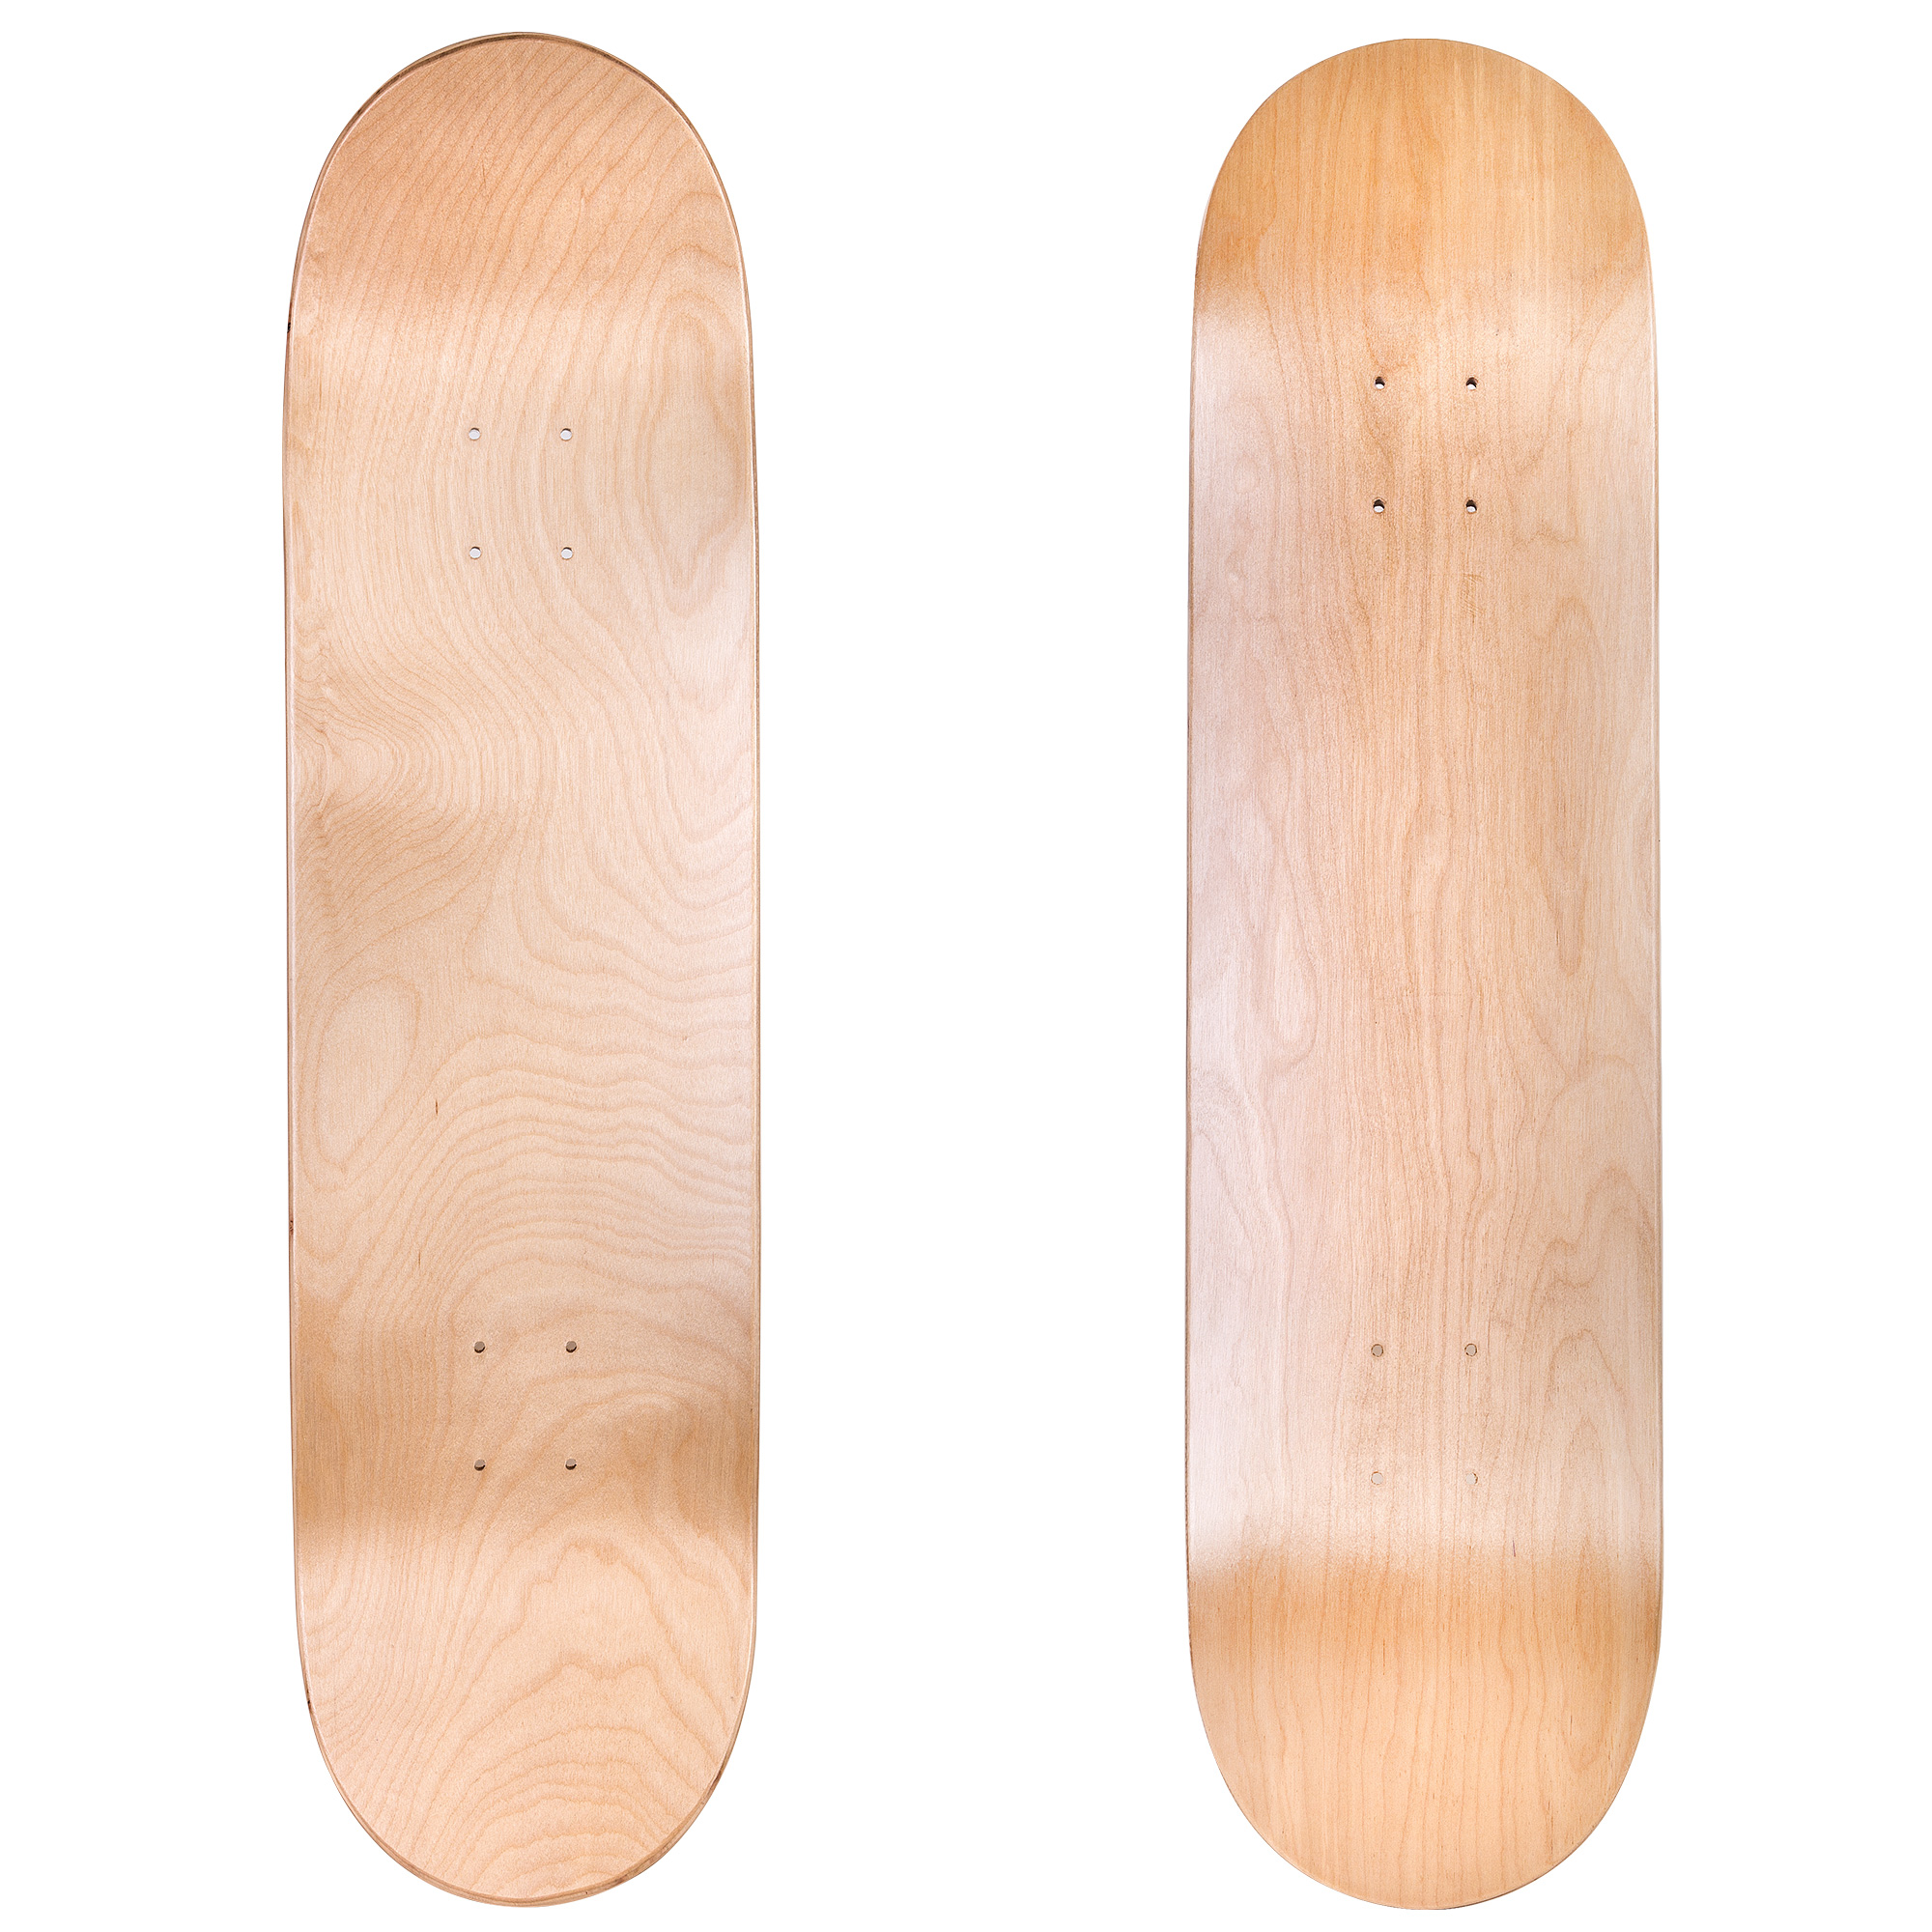 Set of 3 Cal 7 Blank Skateboard Decks